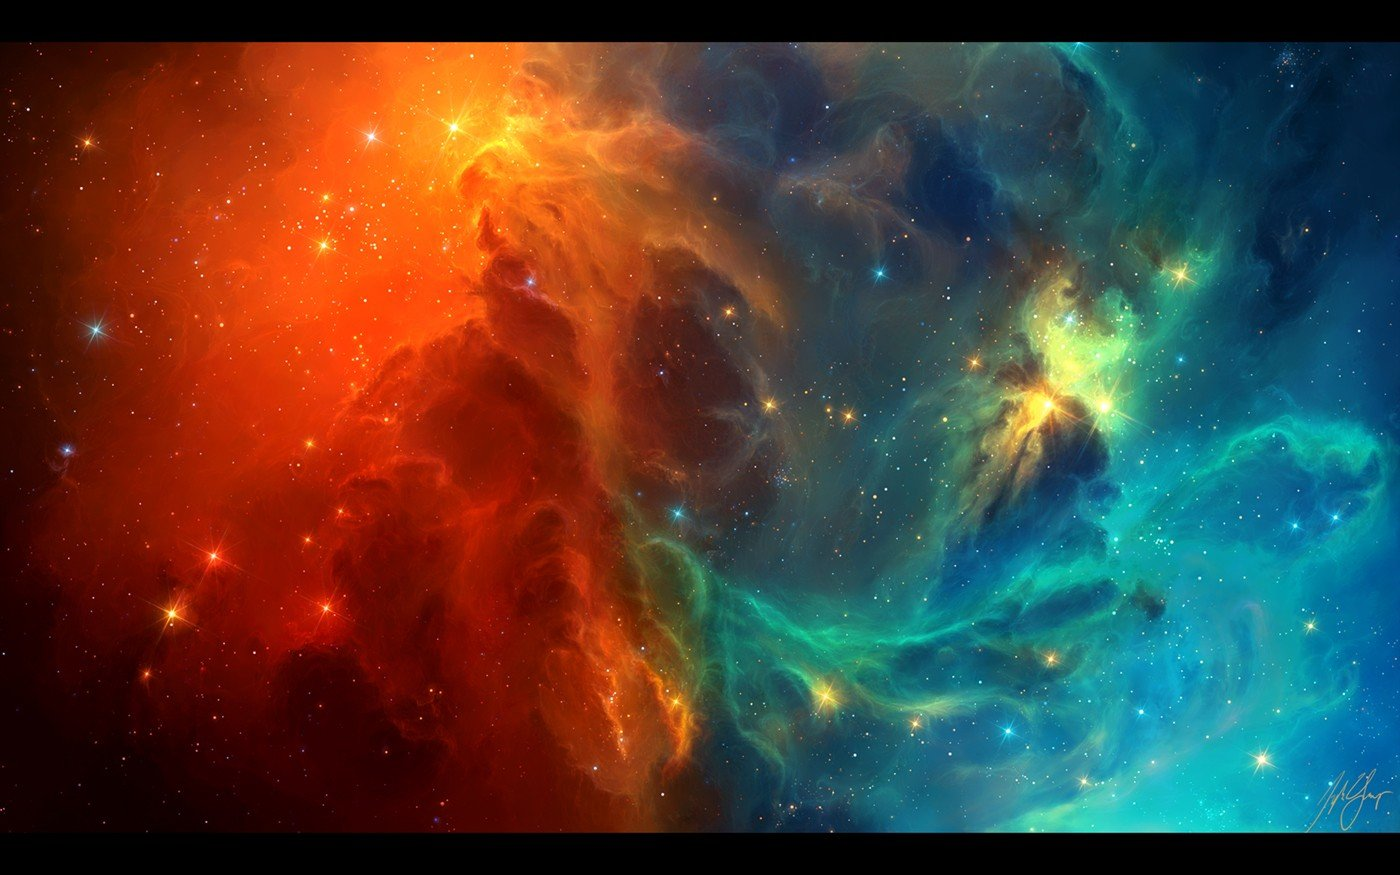 TylerCreatesWorlds, Space, Space art, Nebula, Stars, Galaxy, Digital art Wallpaper